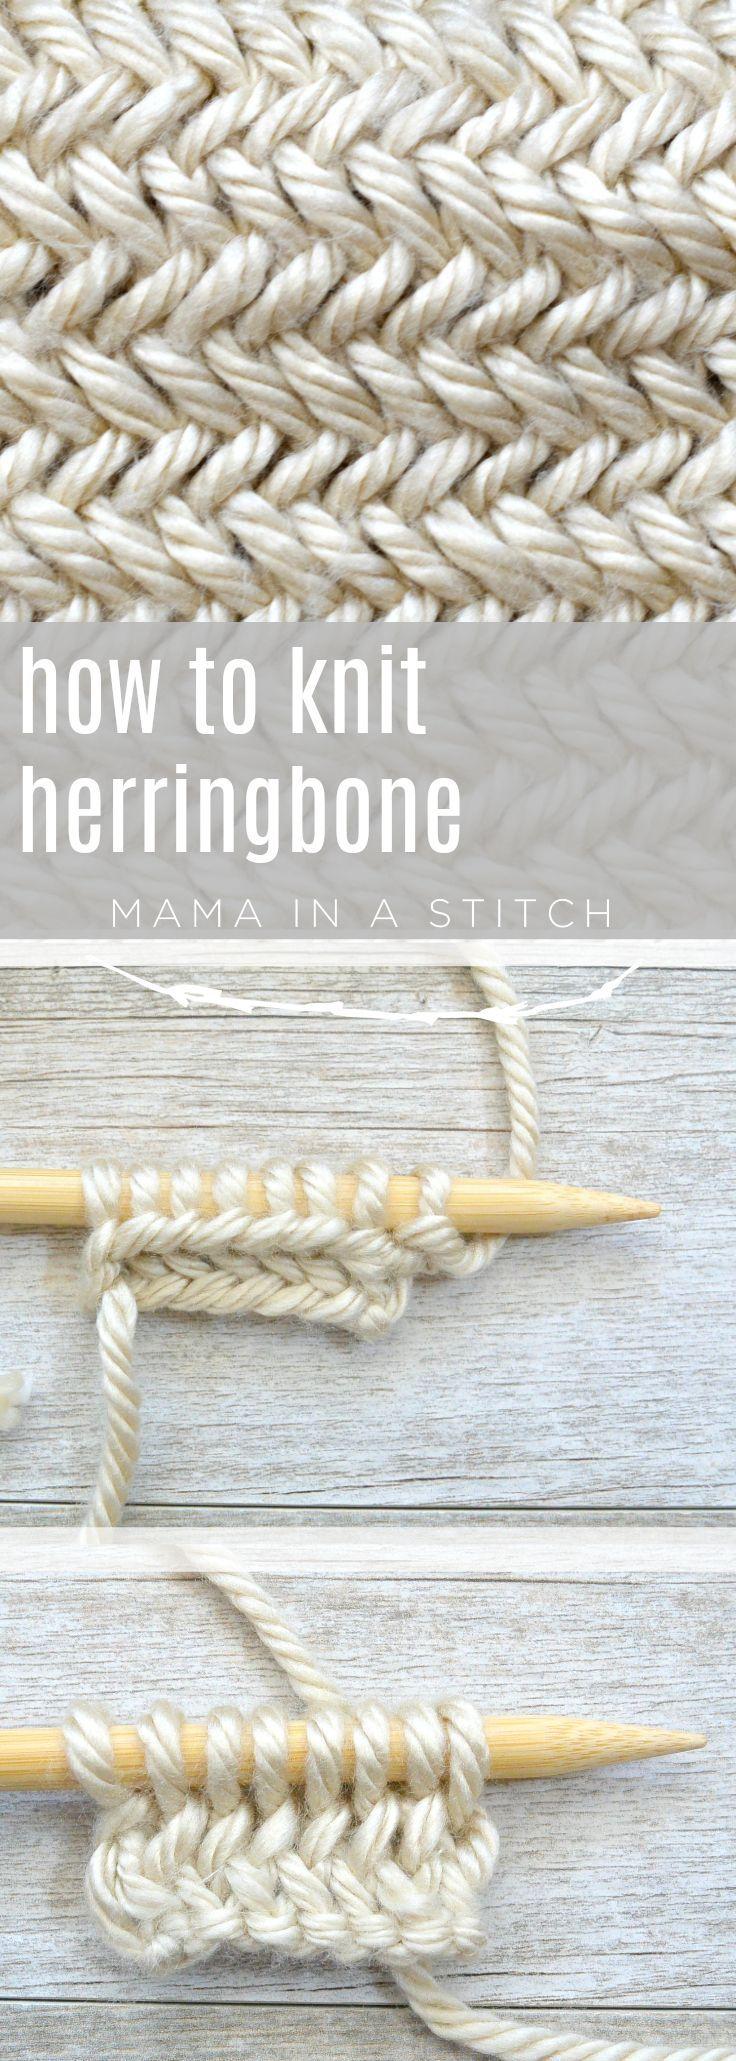 How To Knit the Horizontal Herringbone Stitch #knitting